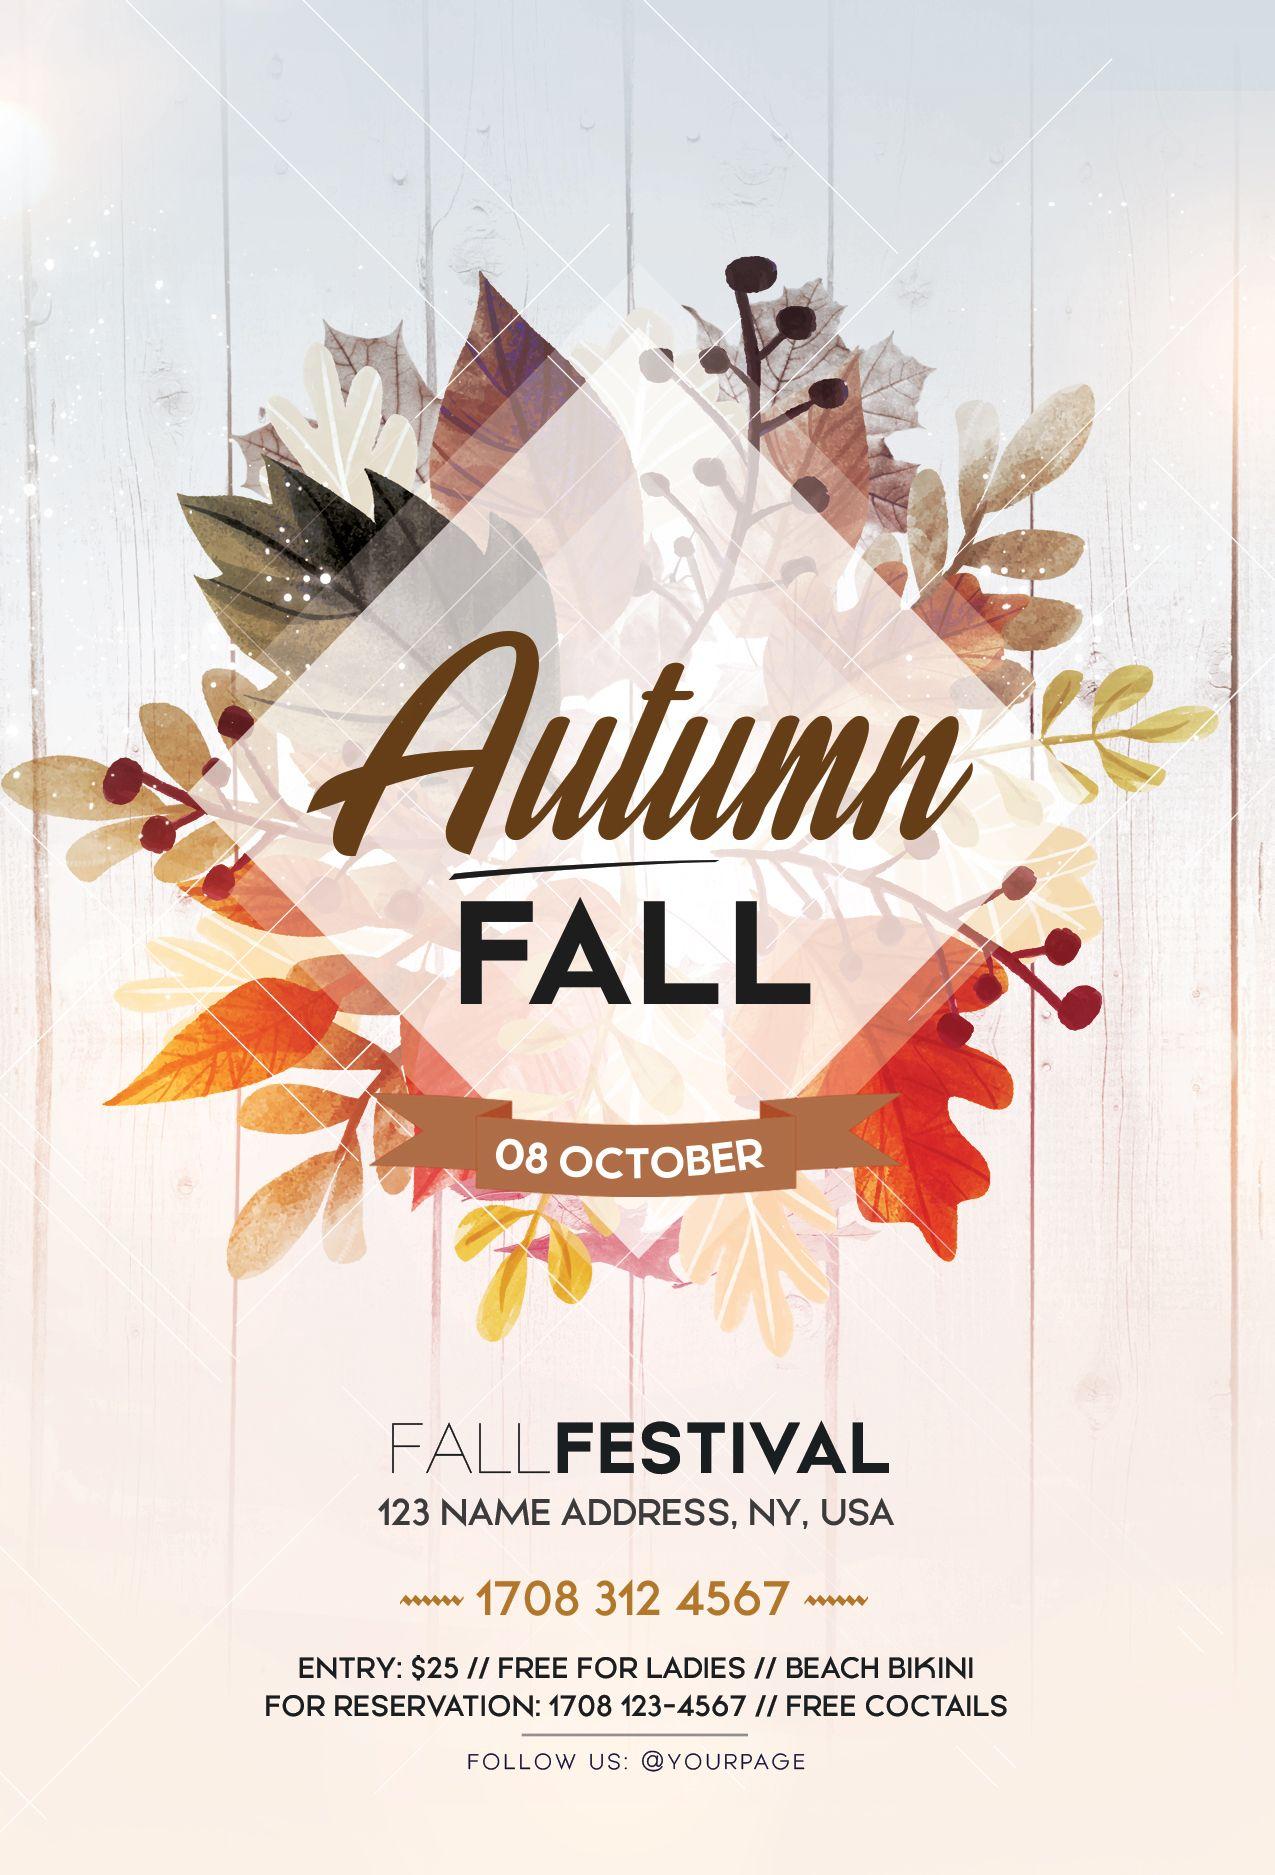 fall festival autumn free psd flyer template flyer autumn freeflyer freepsd